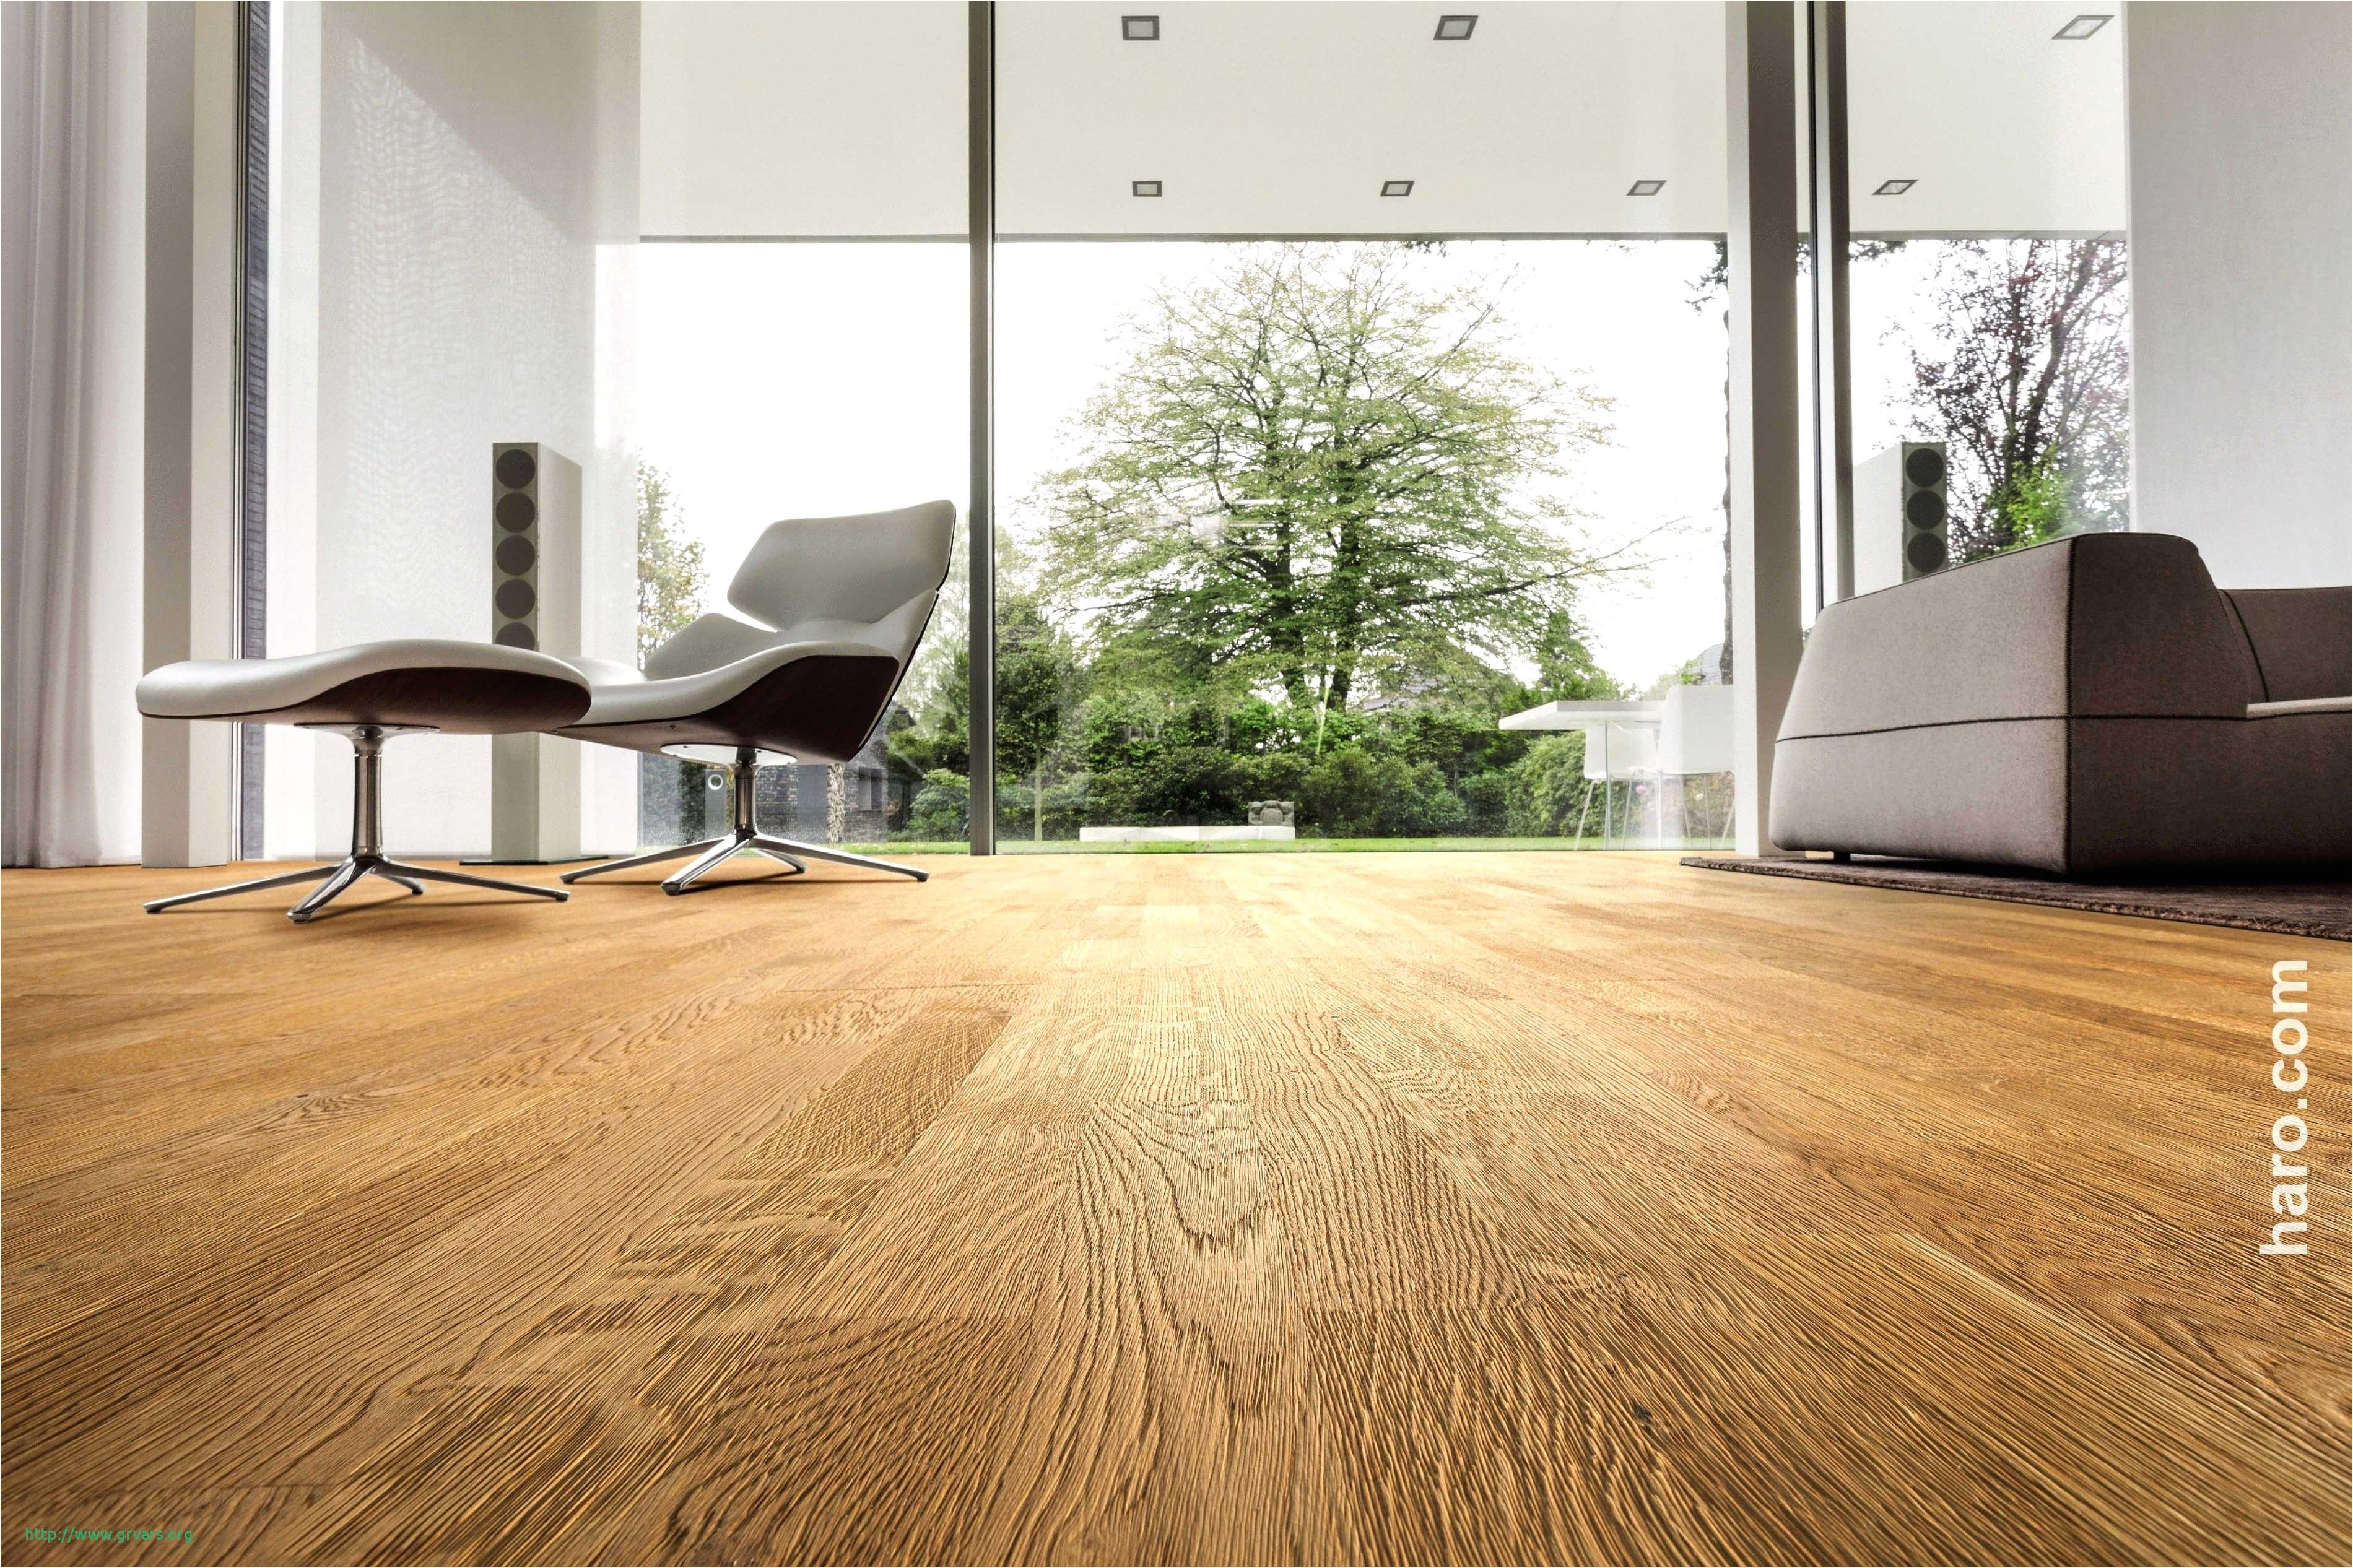 hardwood plank flooring of protect wood floors from furniture bradshomefurnishings inside 24 a legant buy floors direct nashville ideas blog